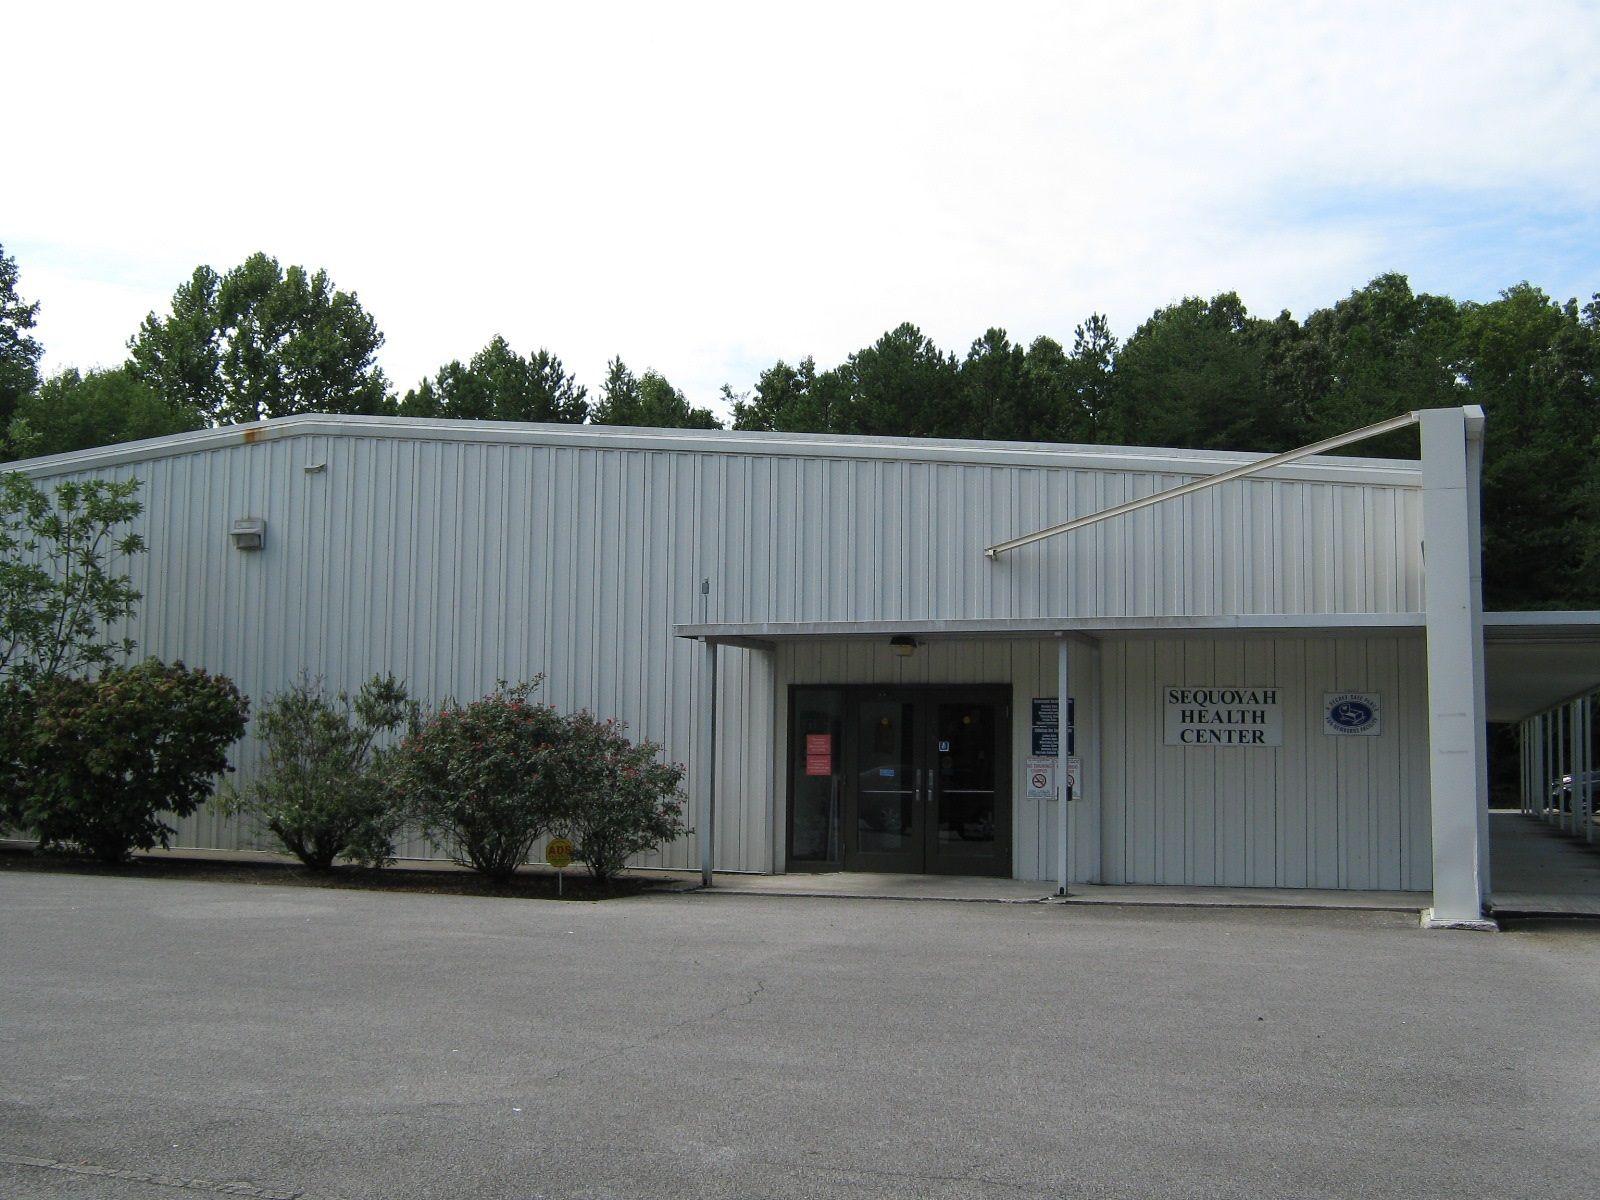 Sequoyah Health Center